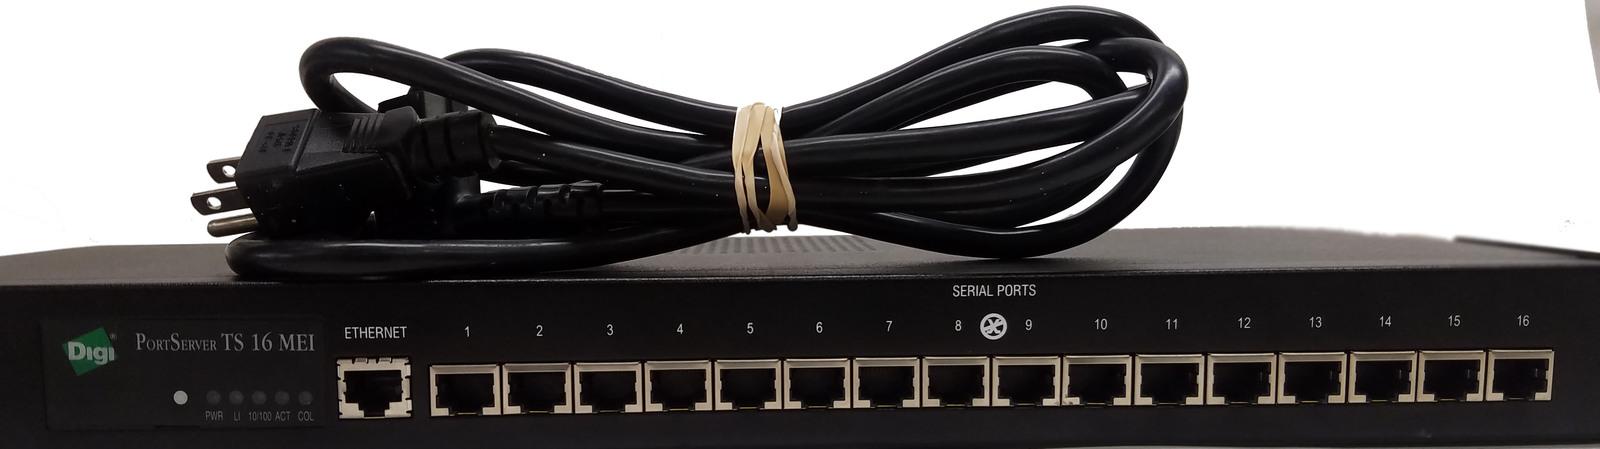 Digi PortServer TS 16 MEI 50000777-06Terminal Console Server Bin: 2